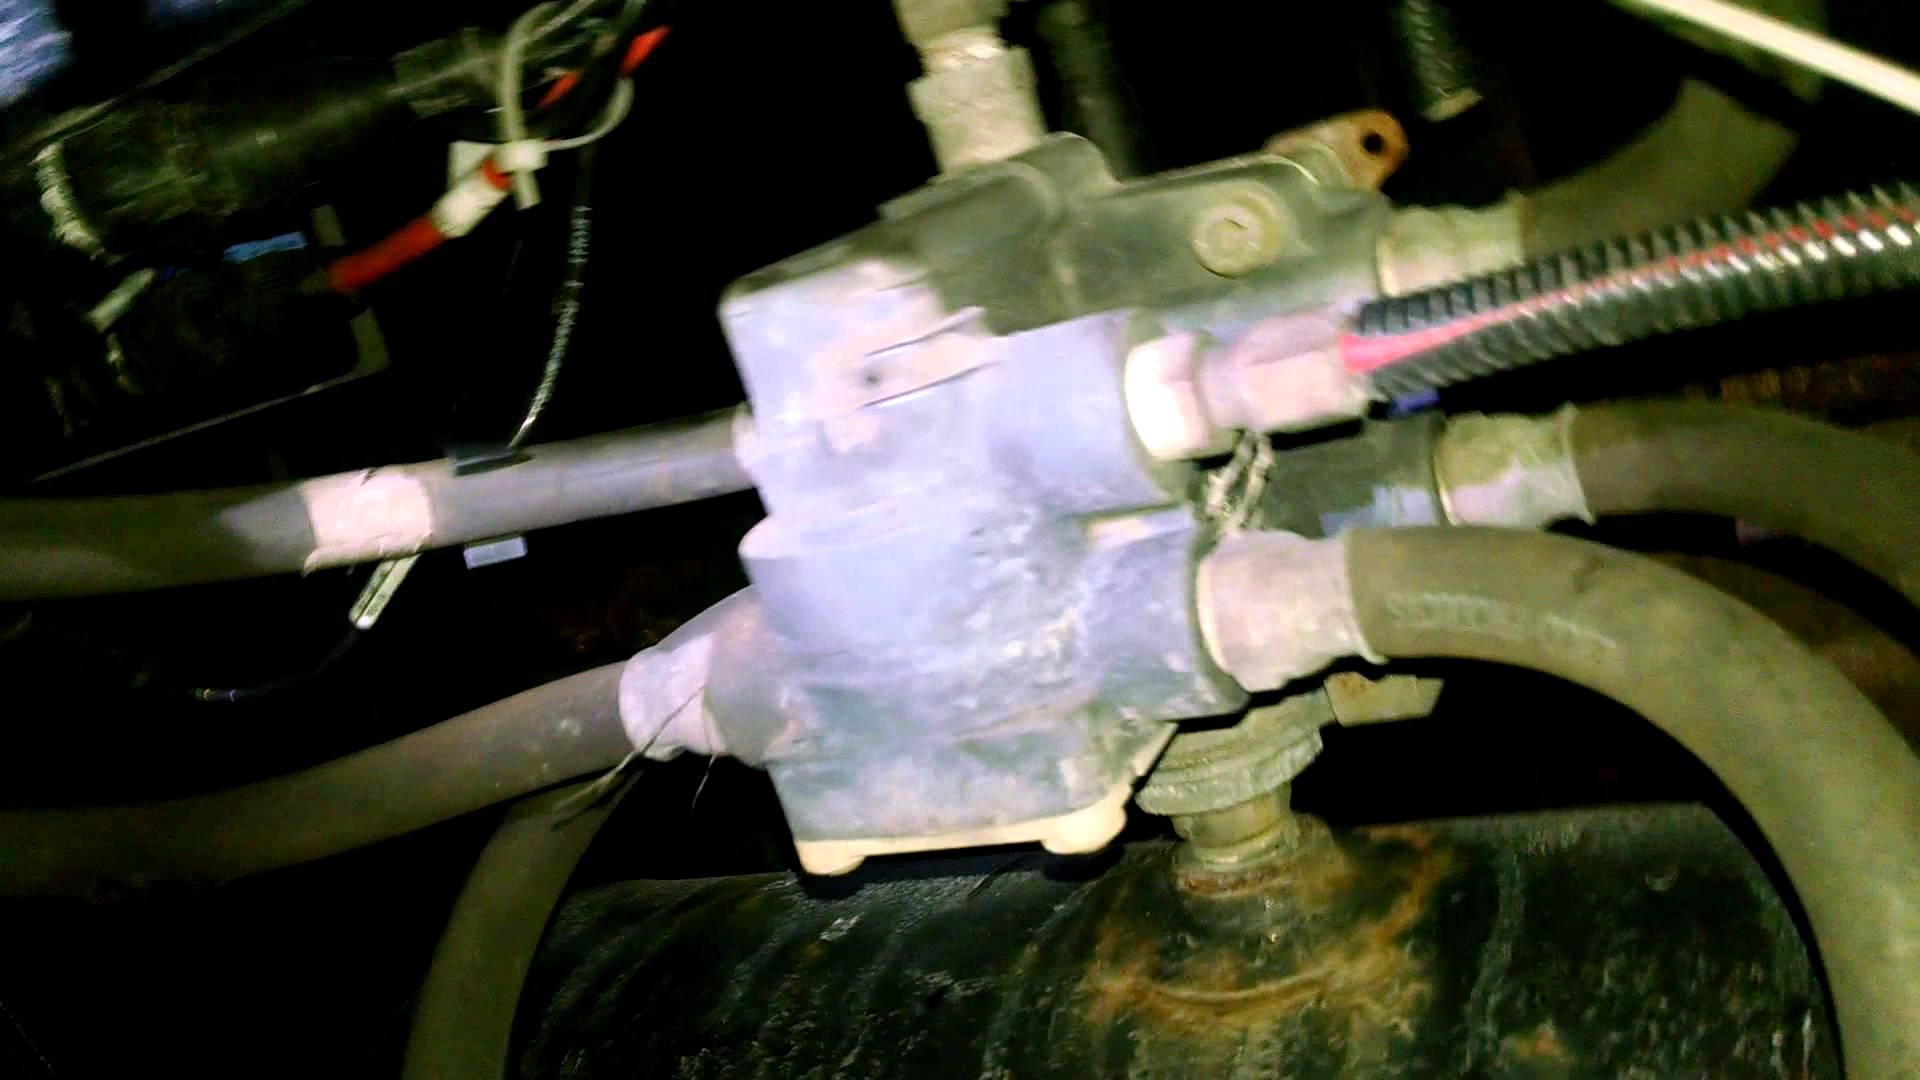 Trailer air valve